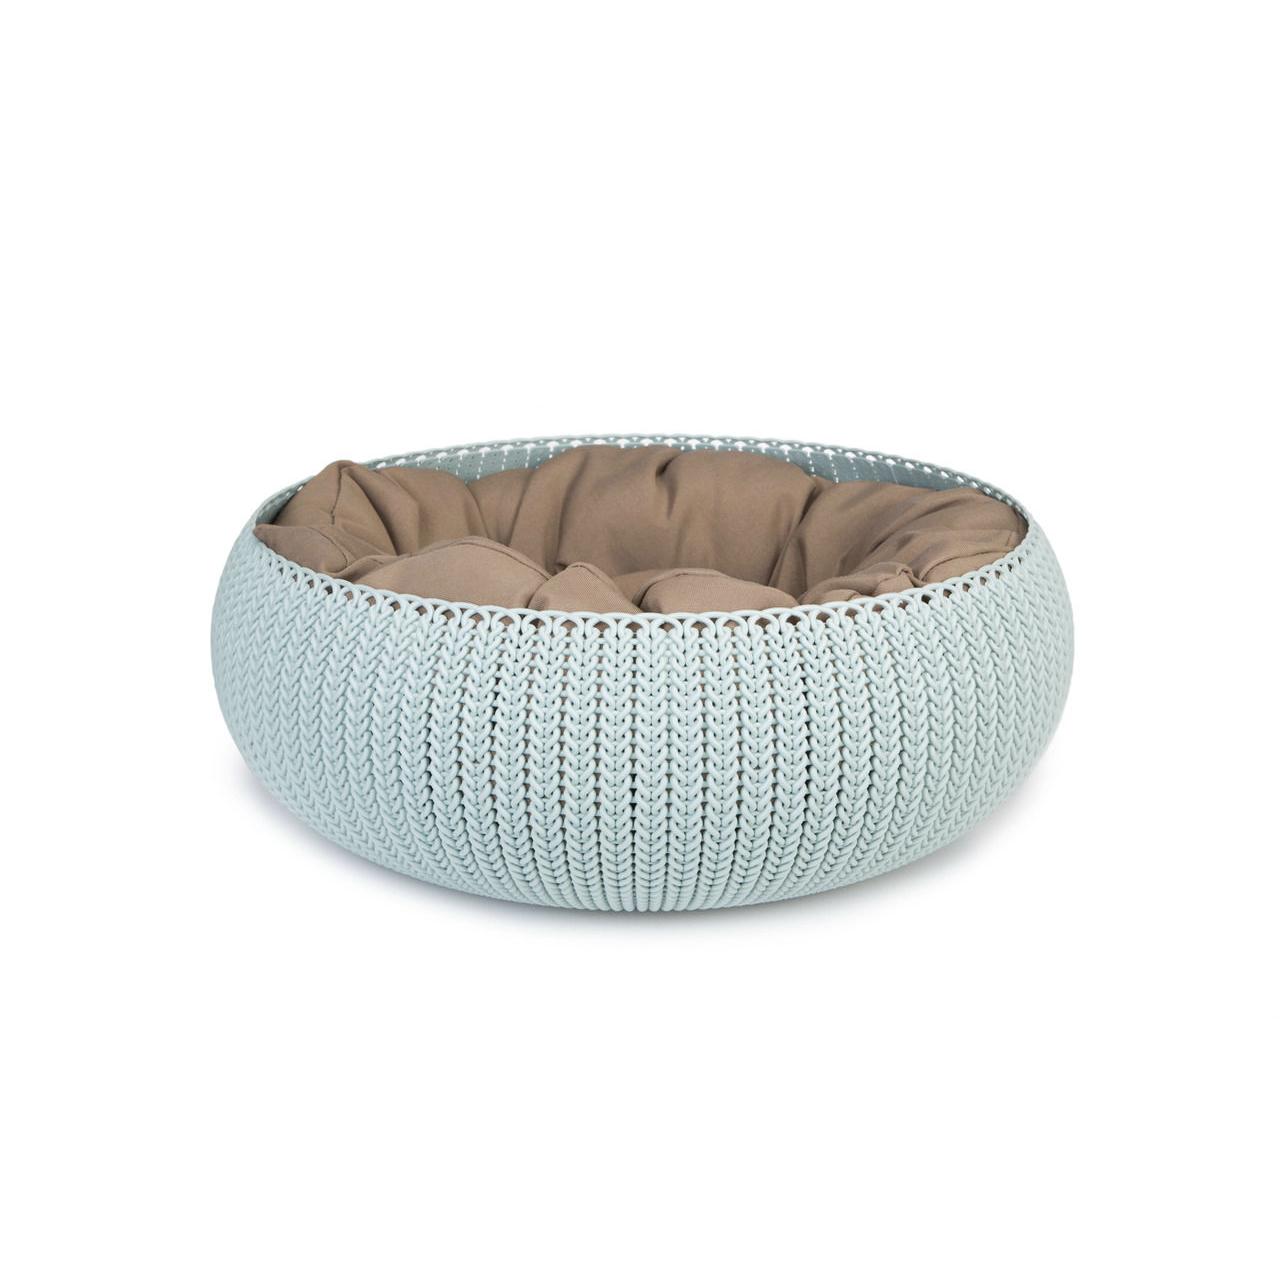 Curver Pet Bed Katzenbett Hundebett, Bild 3